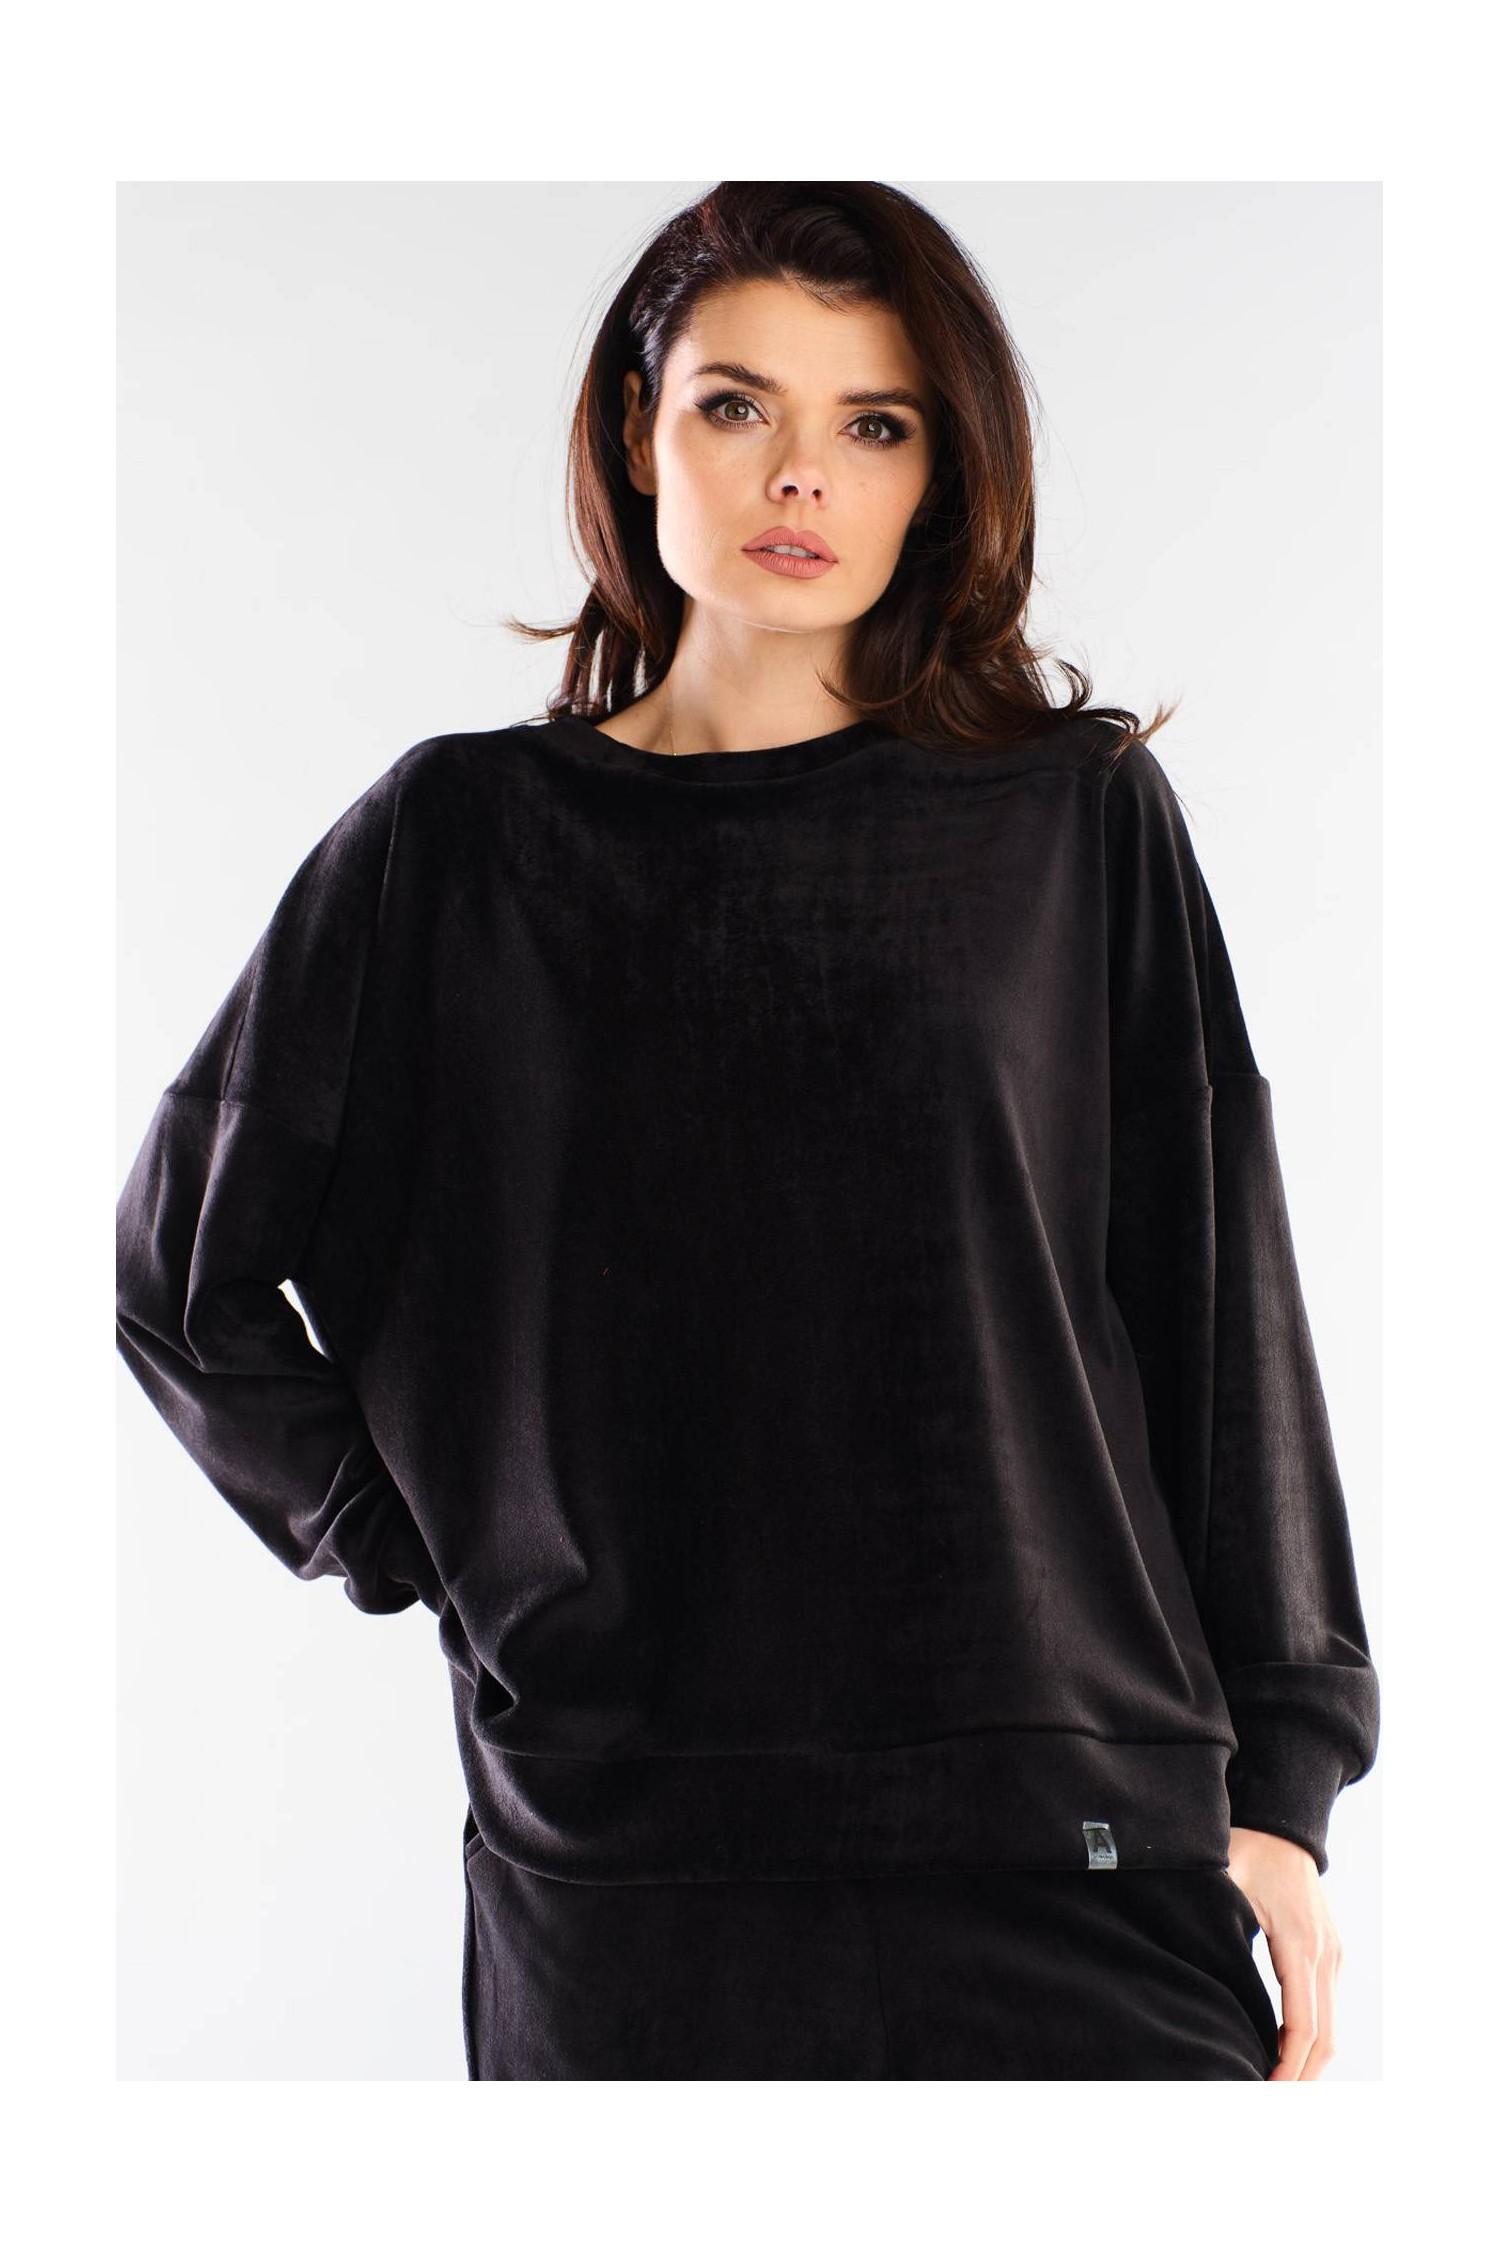 A410 - Velor Sweatshirt